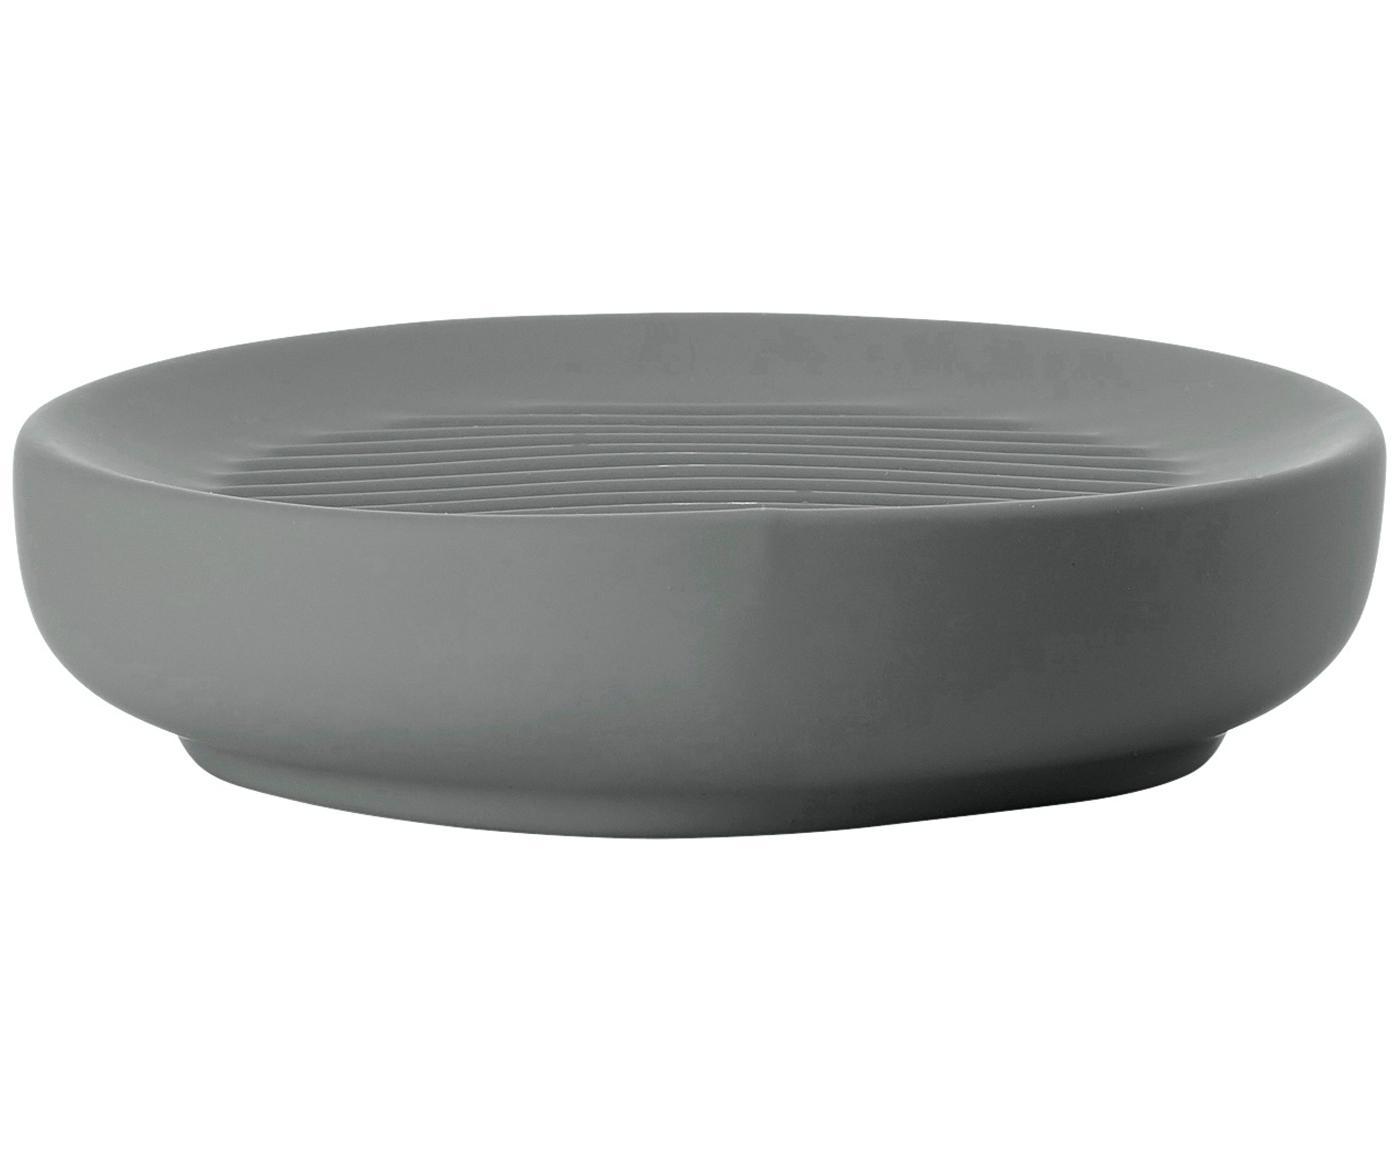 Zeephouder  Ume, Porselein, Grijs, Ø 12 x H 3 cm